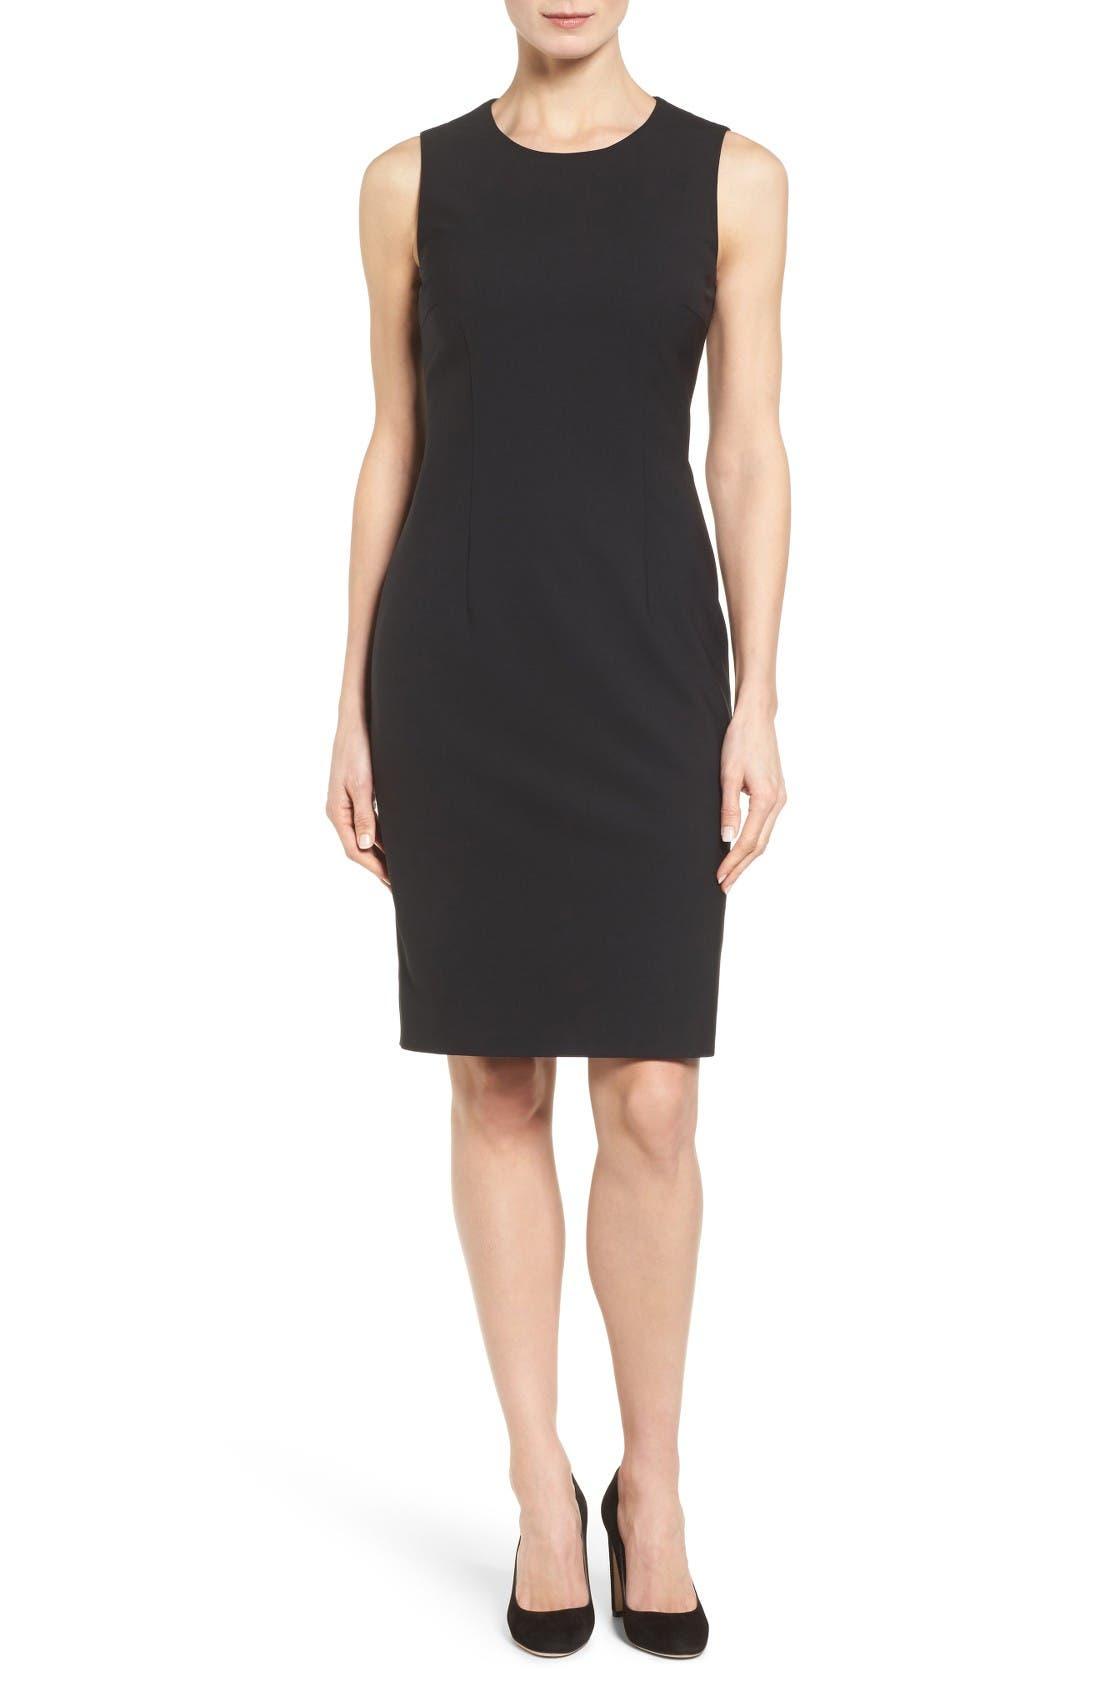 Dirusa Tropical Stretch Wool Dress,                         Main,                         color, Black